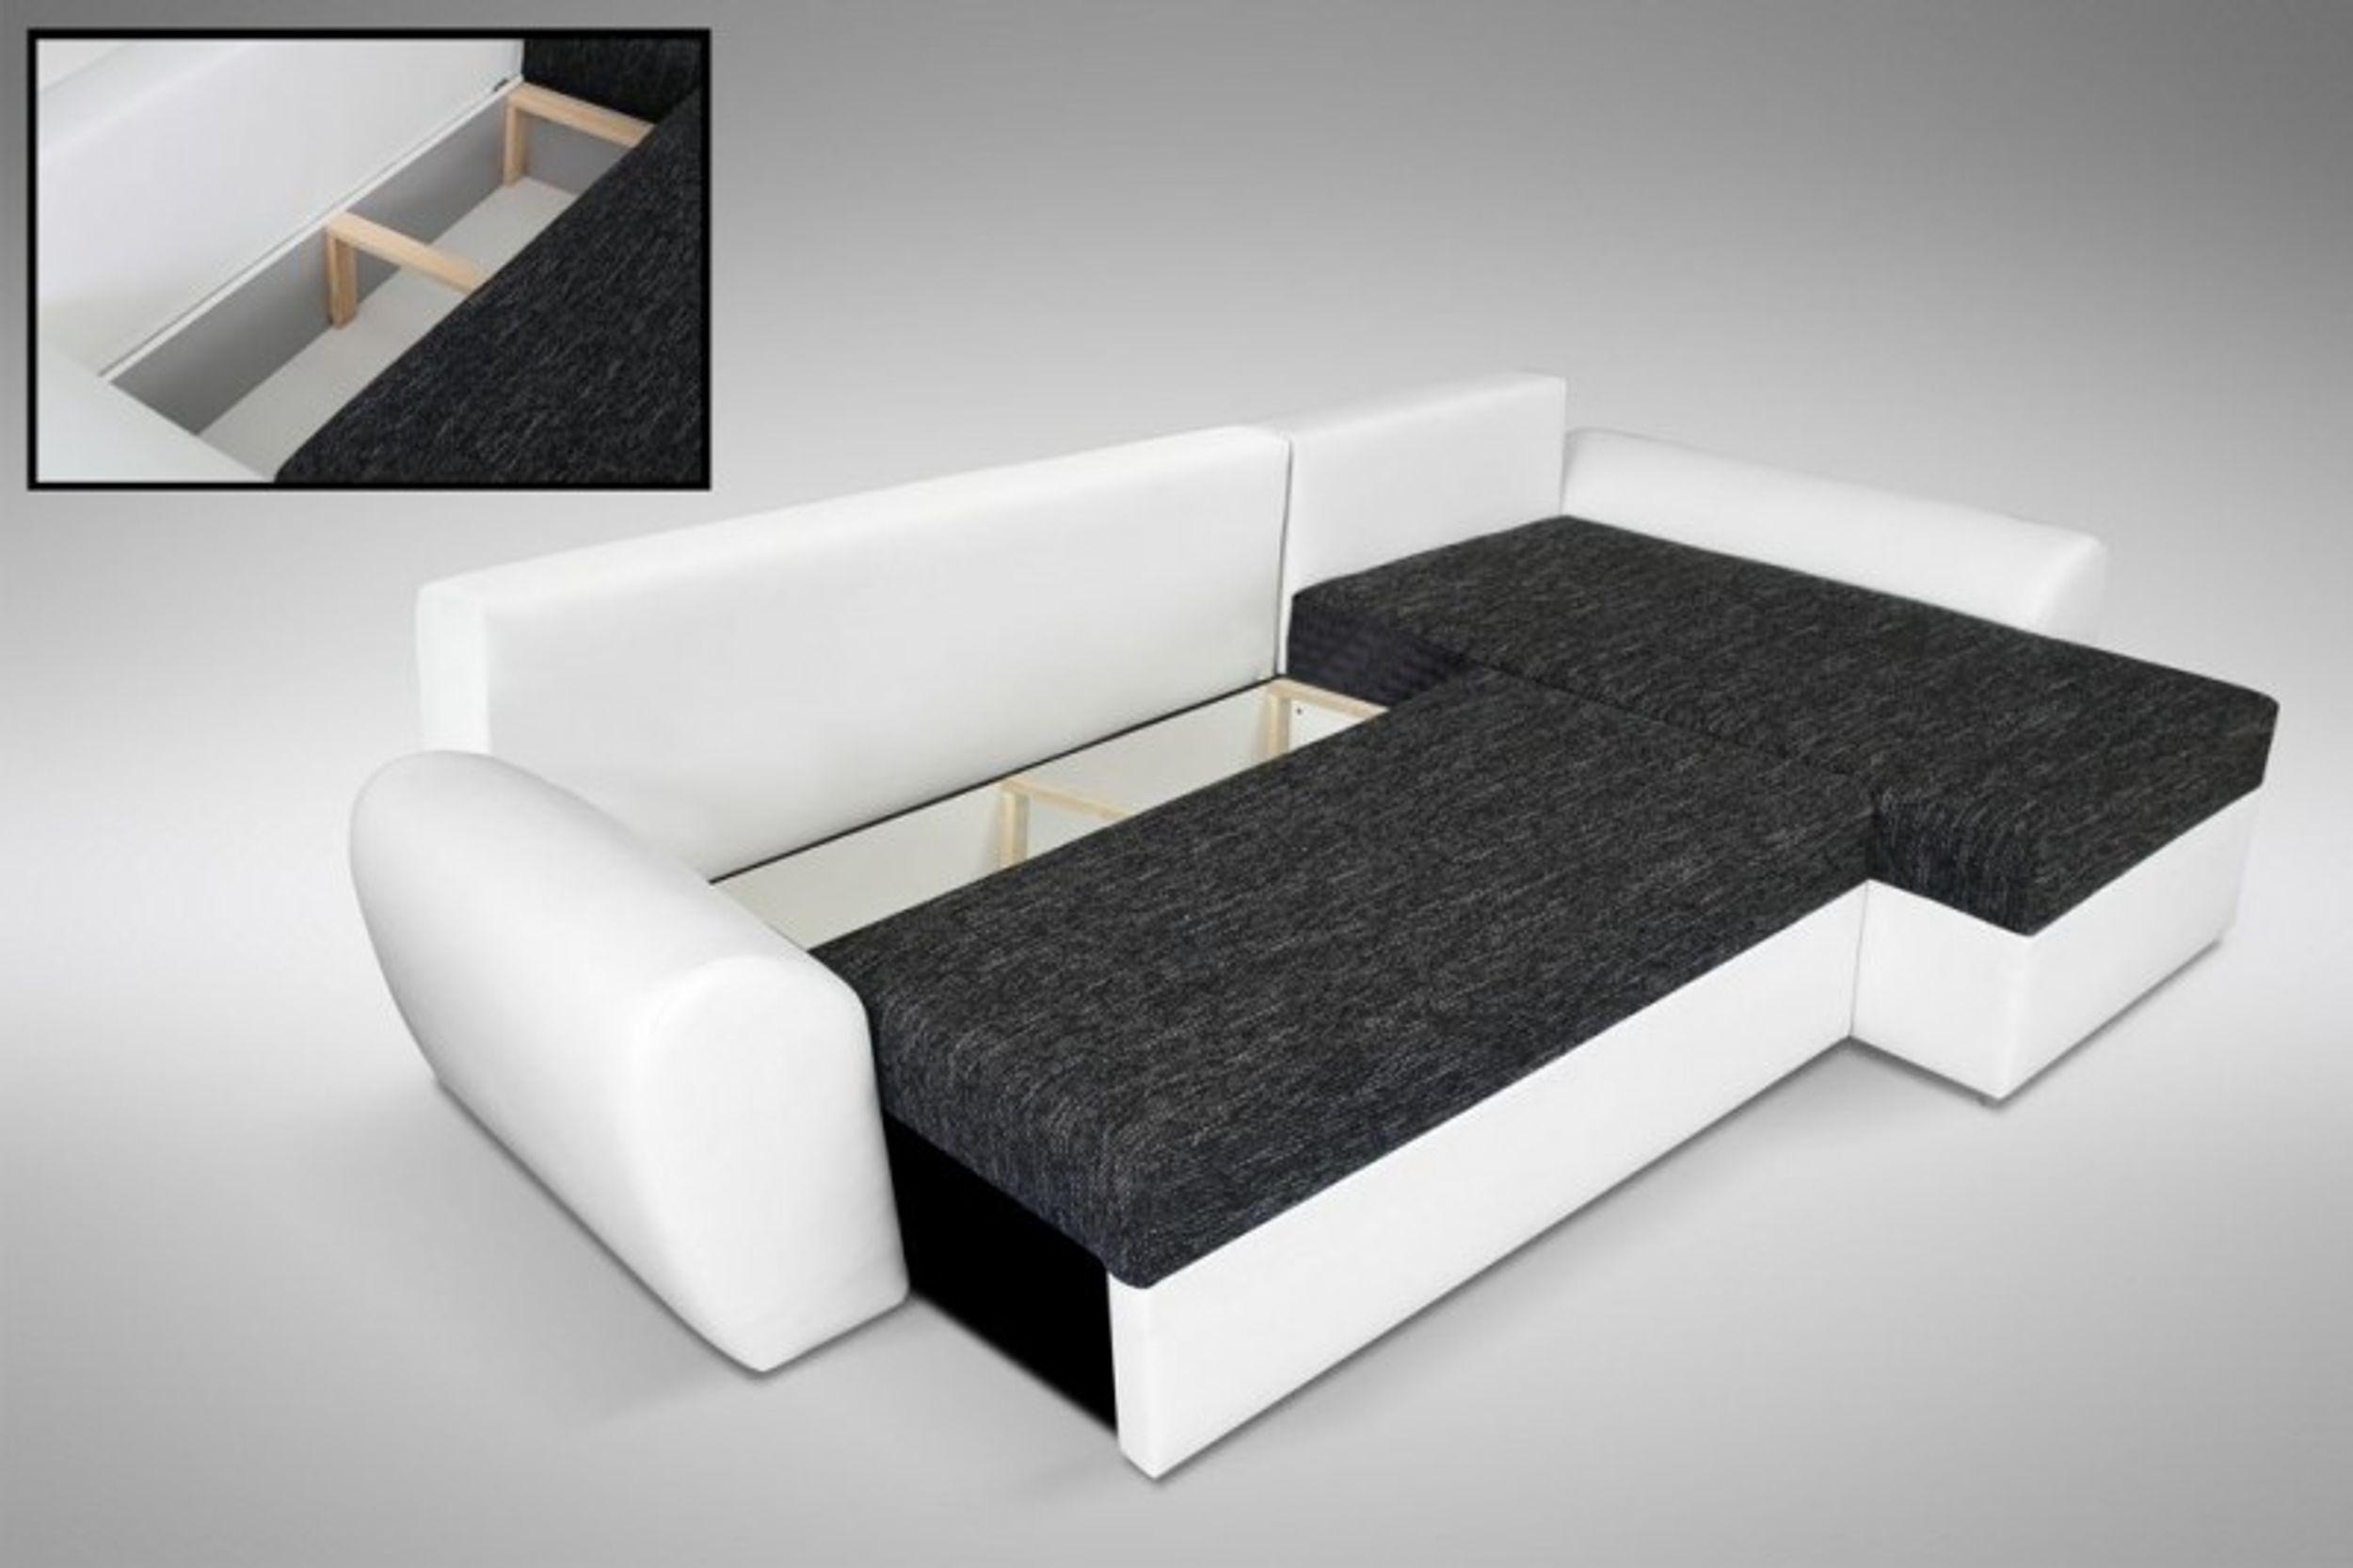 Schlafsofa Sofa Couch Ecksofa Eckcouch Schwarz/Weiss